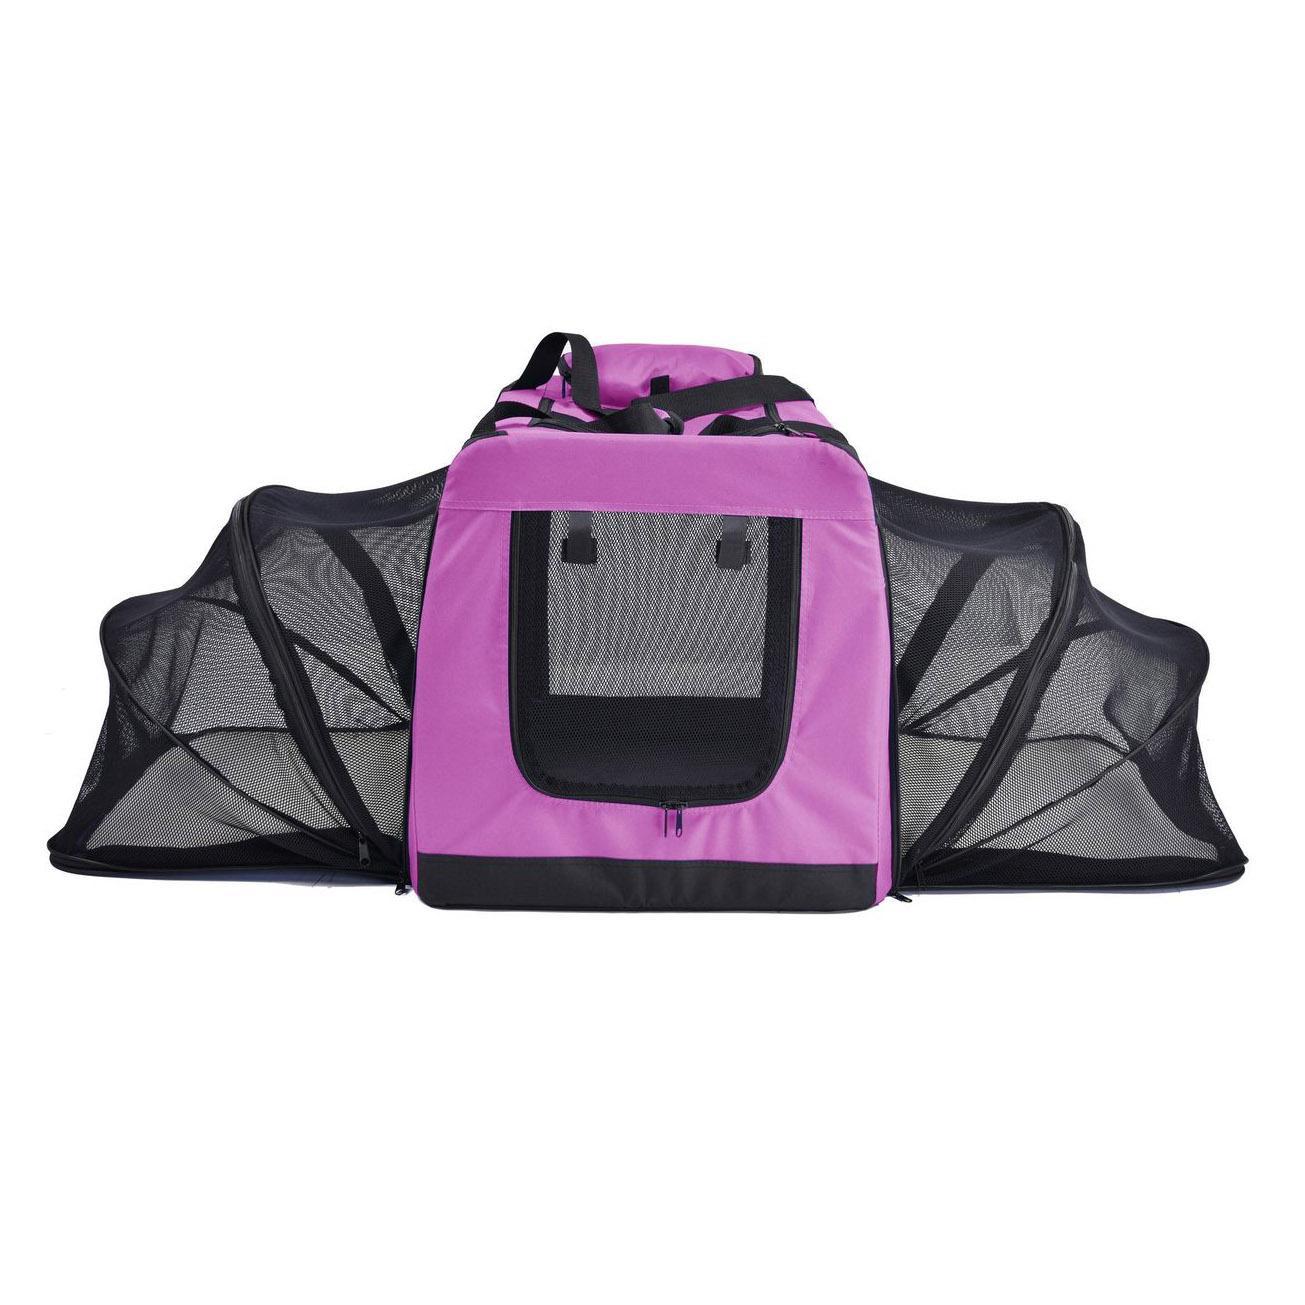 Pet Life Hounda Accordion Metal Frame Soft Folding Expandable Dog Crate - Pink